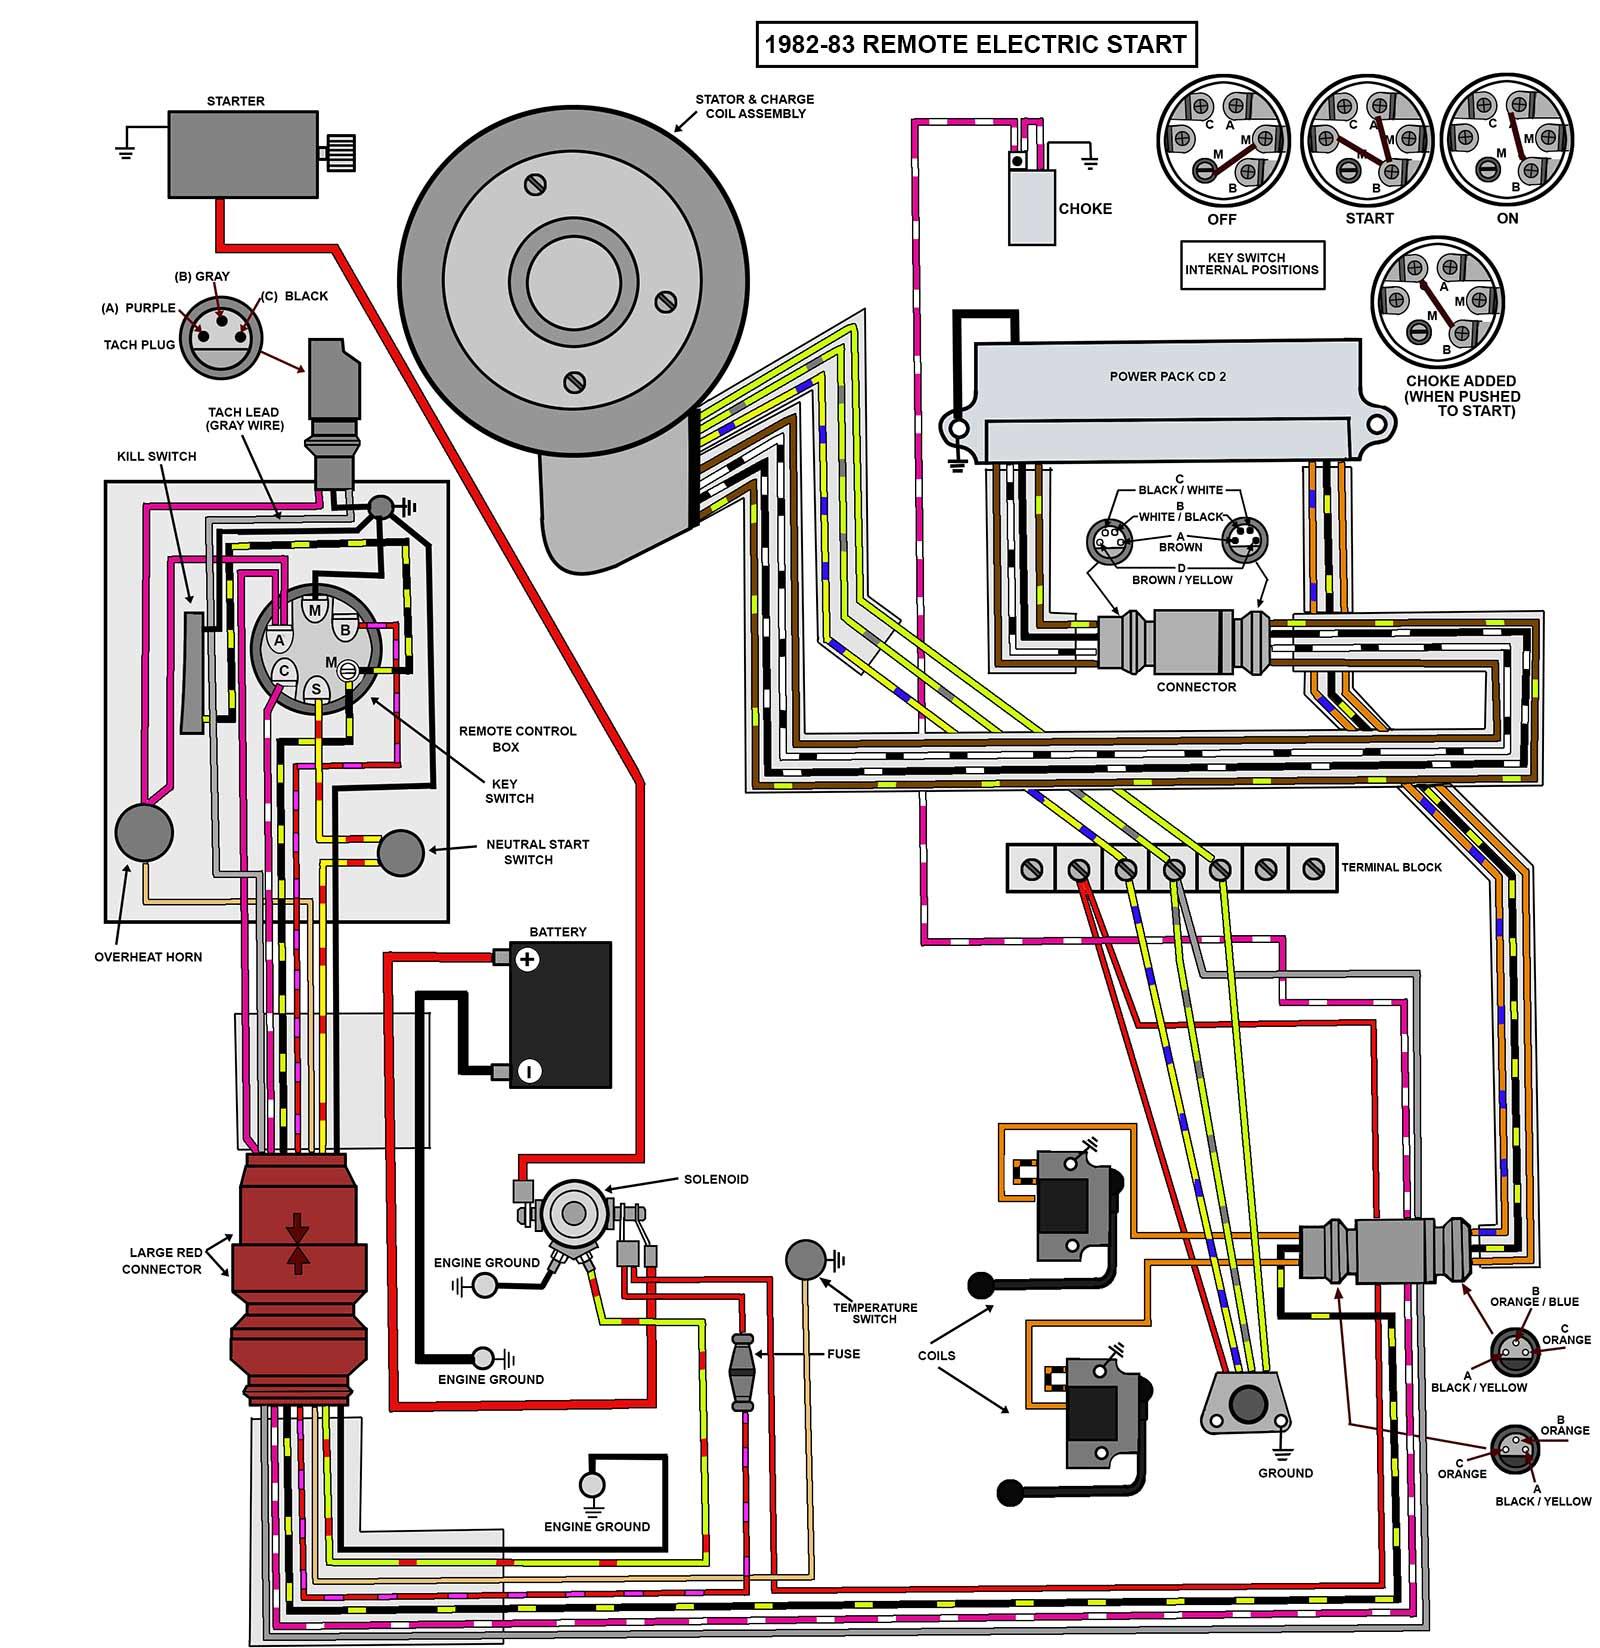 omc wiring diagram wiring diagram schemes Johnson OMC Control Box Parts omc throttle control box wiring diagram